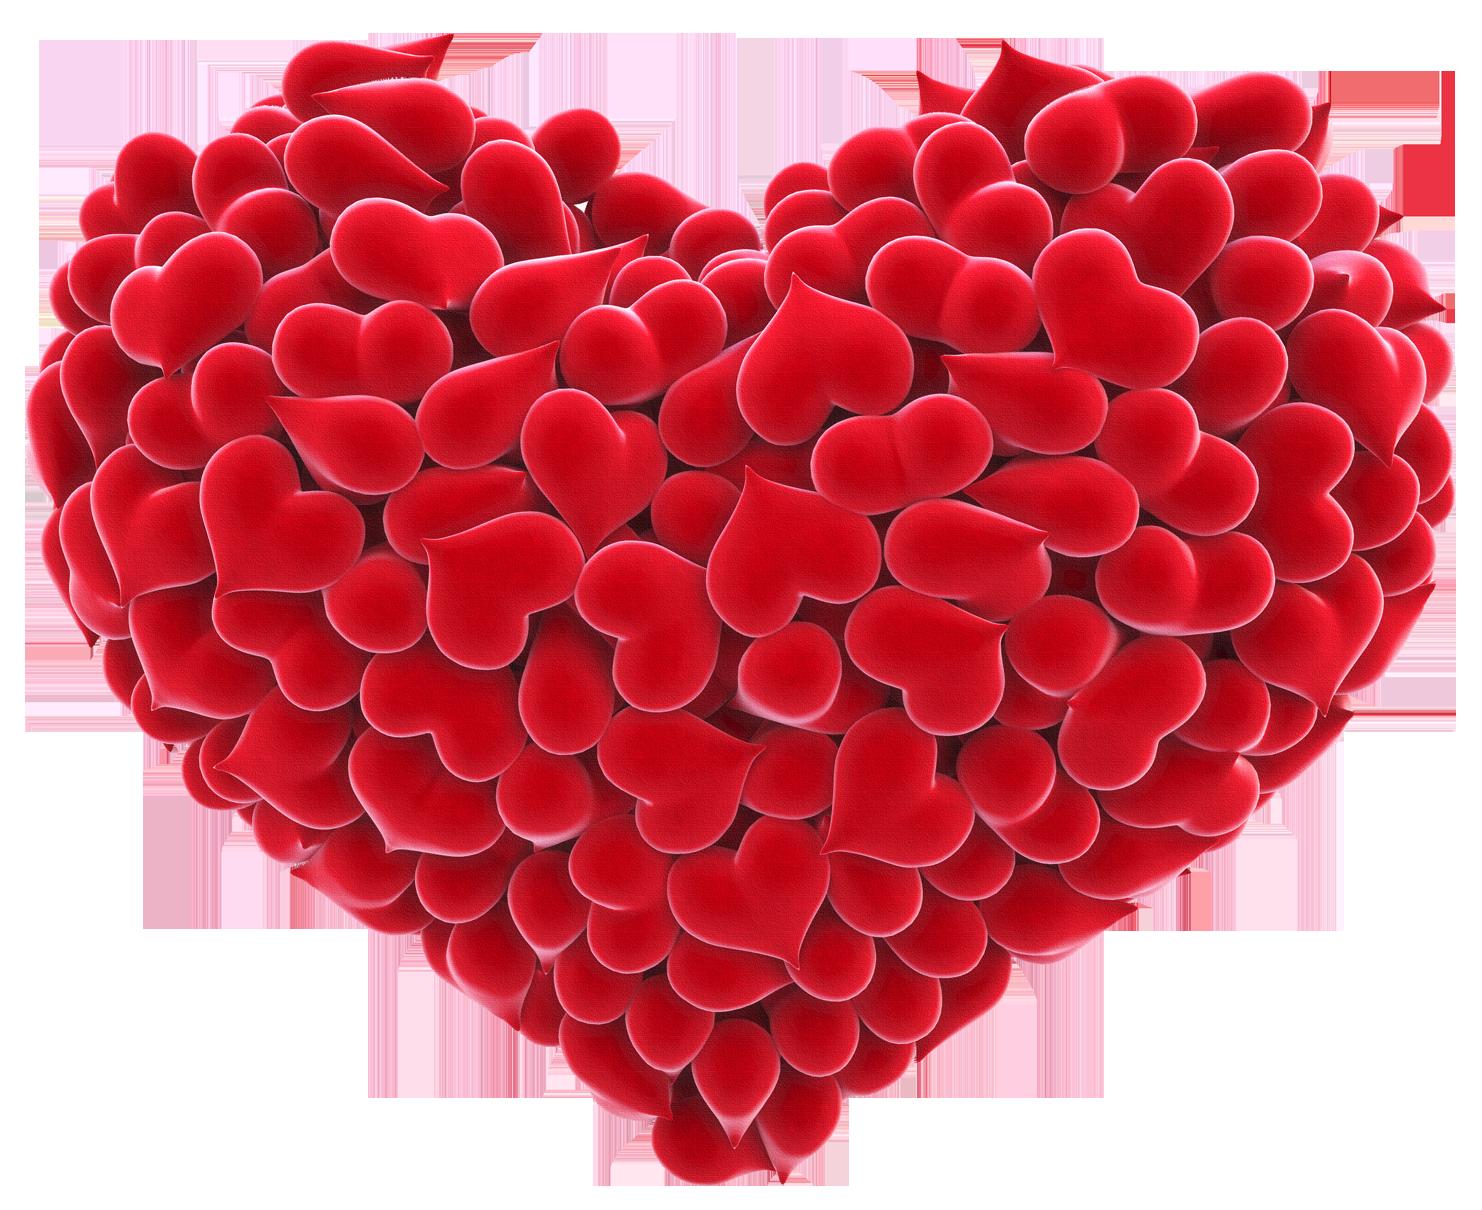 Картинка сердце большое красивое